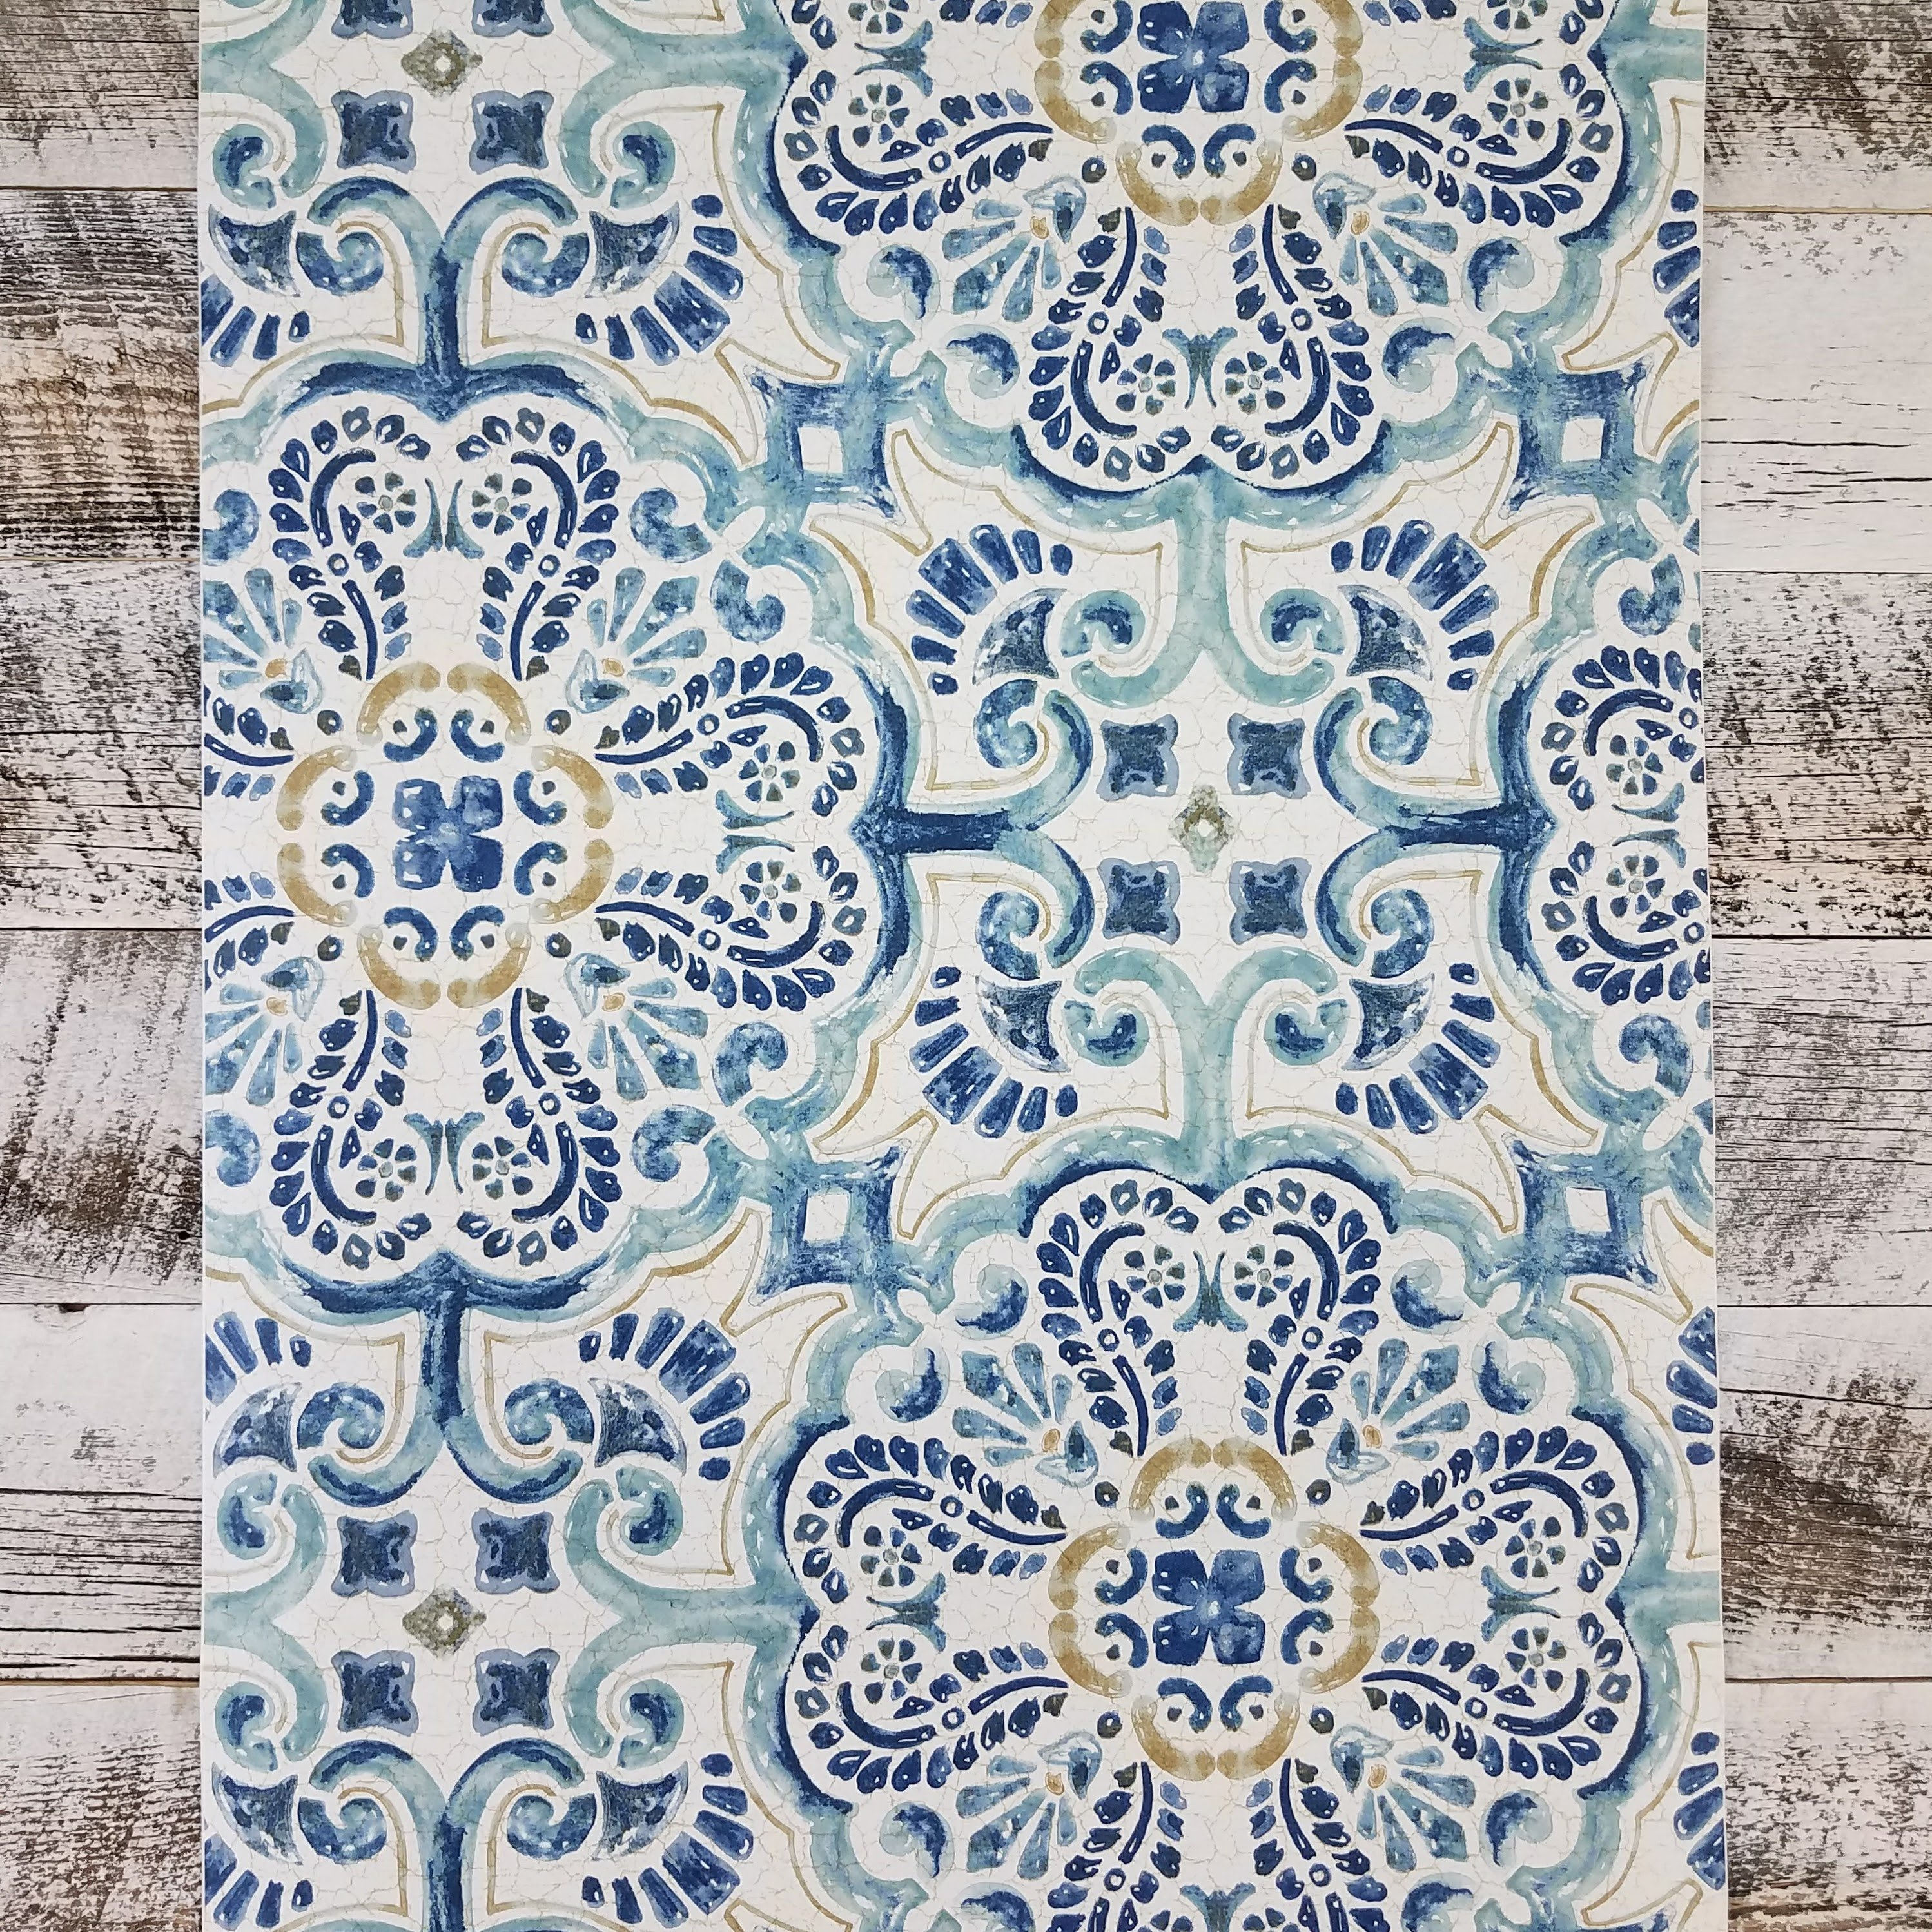 Blue Florentine Tile Peel And Stick Wallpaper Blue Peel And Stick Wallpaper Tile Wallpaper Vinyl Wallpaper